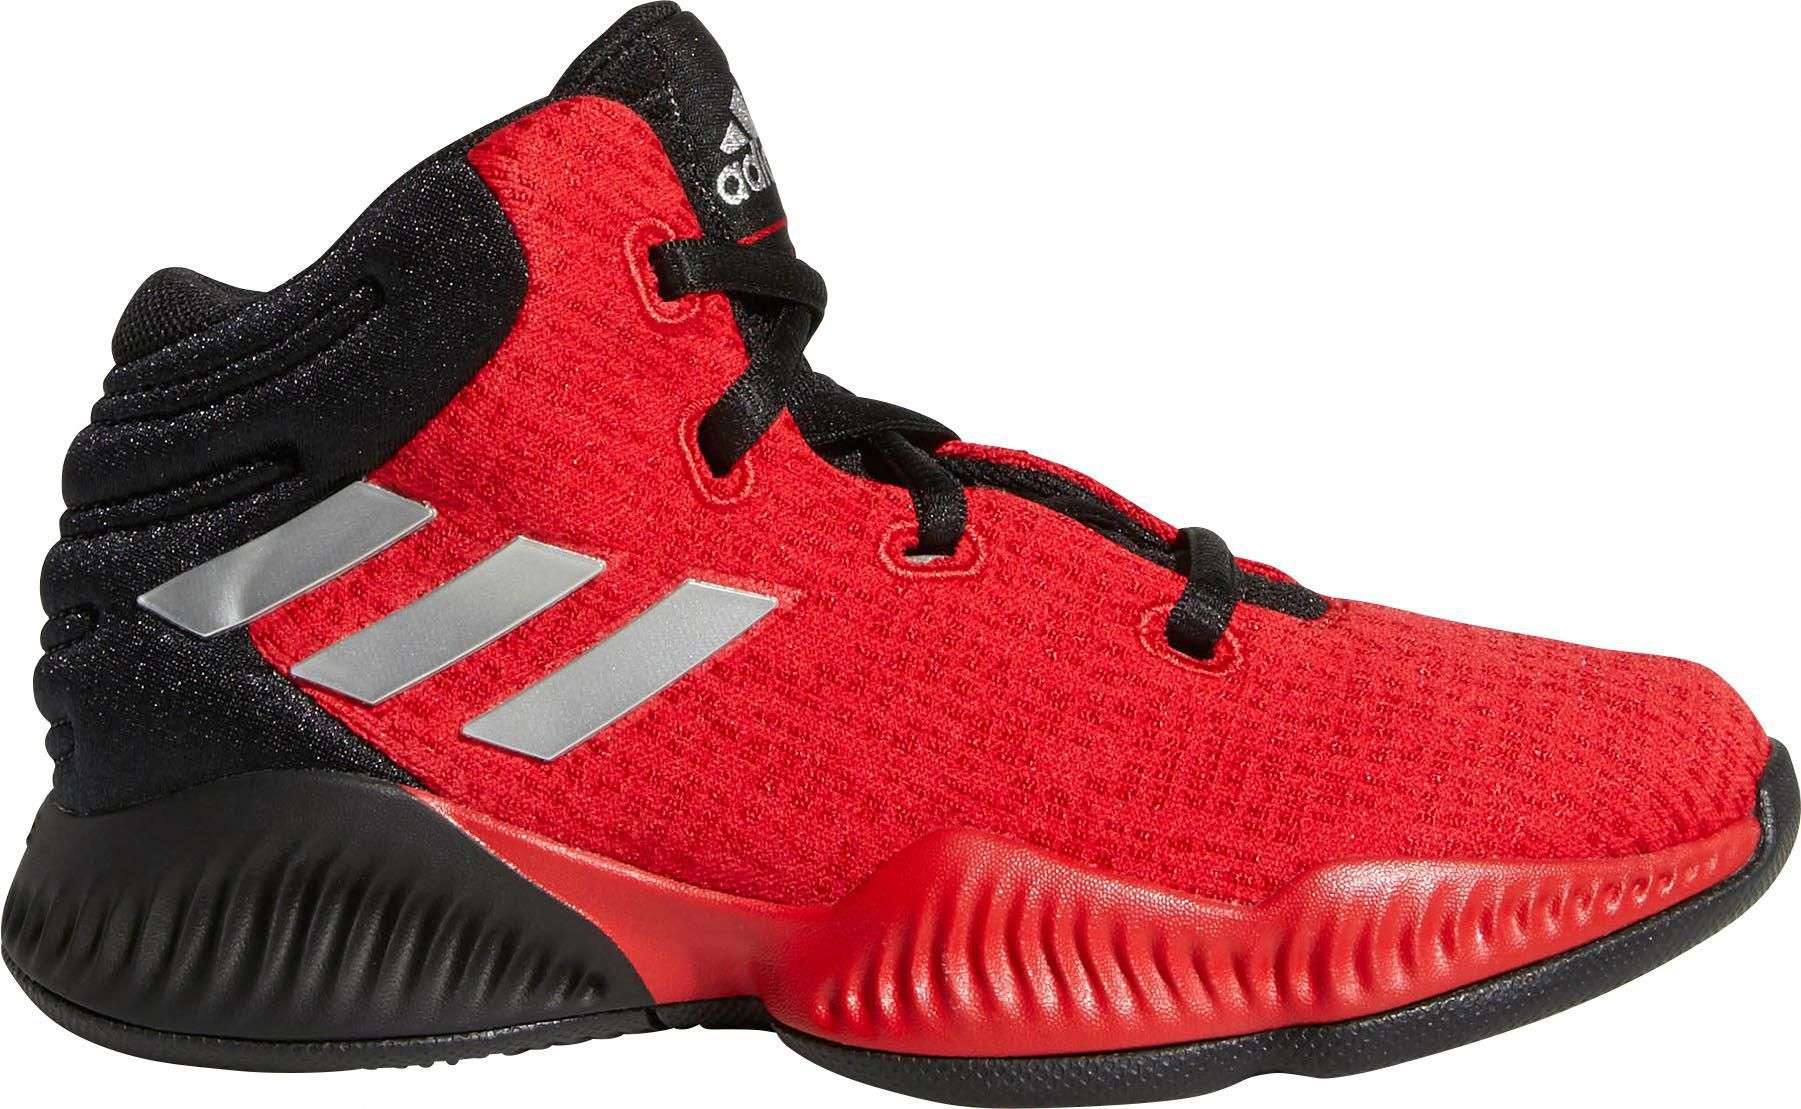 Adidas Kids Preschool Mad Bounce Basketball Shoes Black Adidasbasketballshoes Basketball Shoes Adidas Basketball Shoes Basketball Shorts Girls